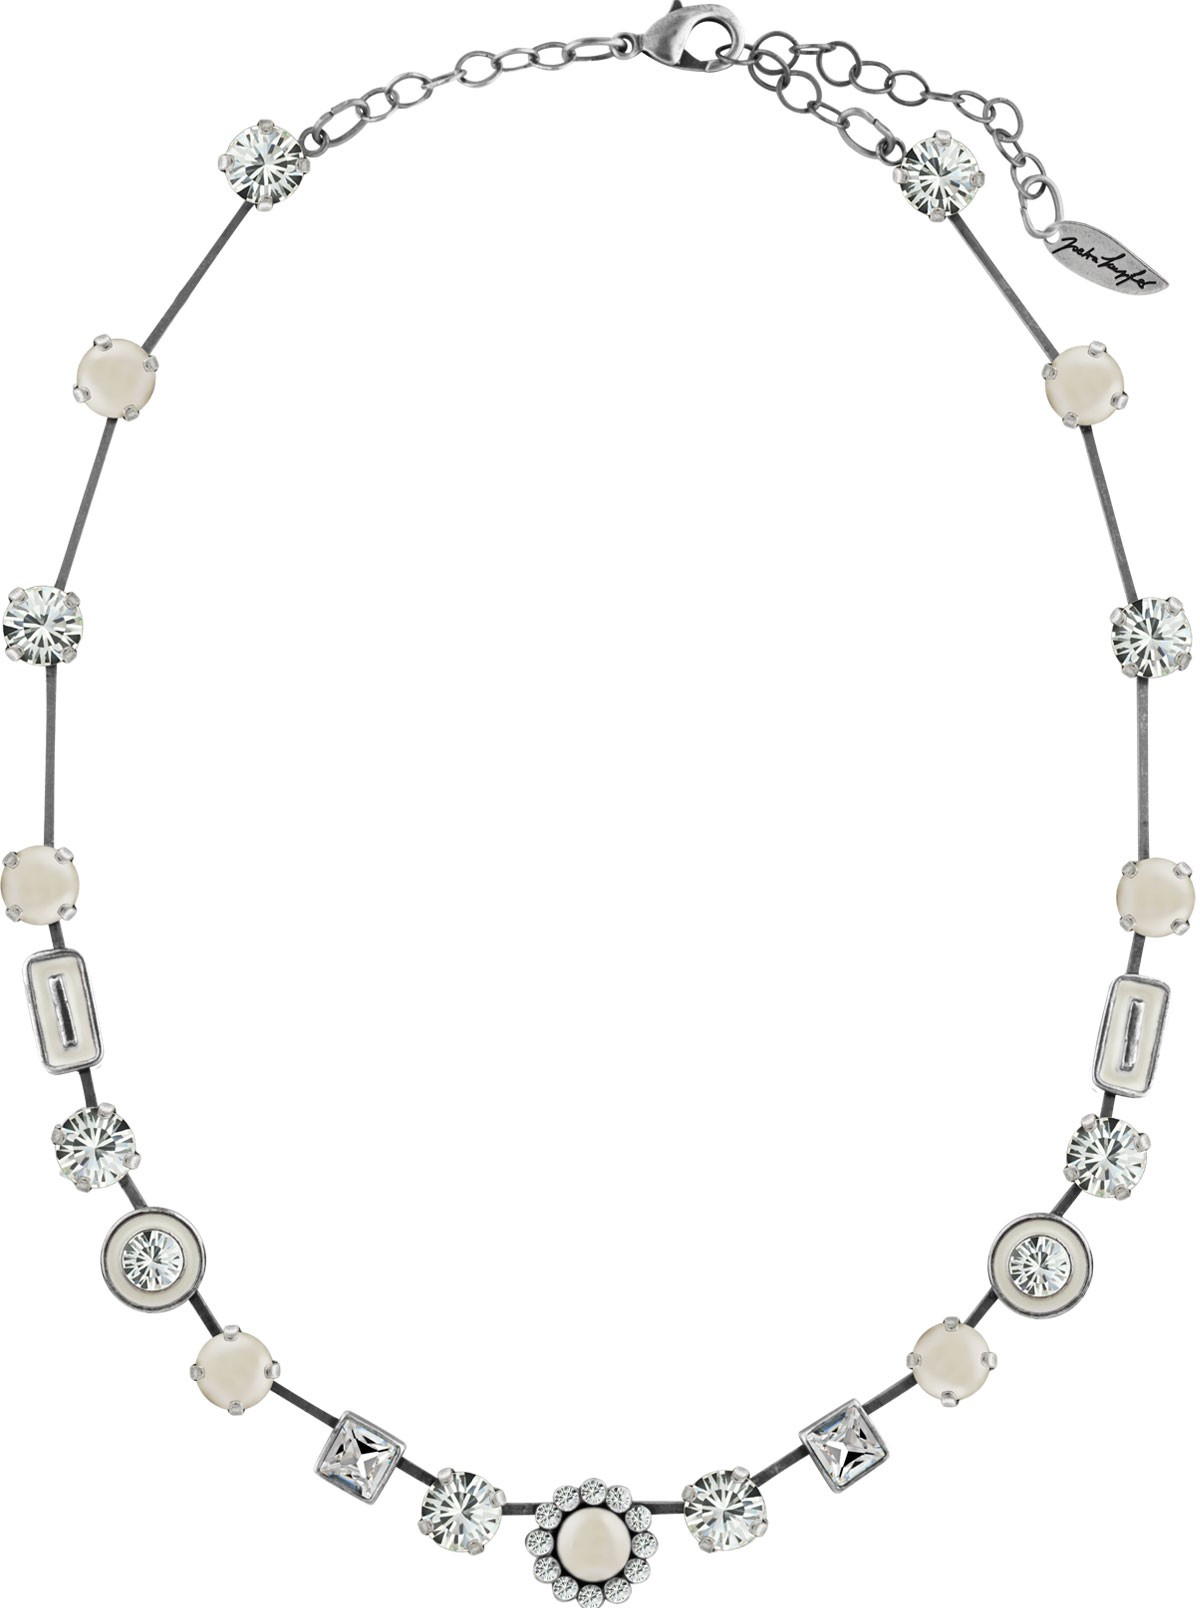 halskette-glamour-collier-made-with-swarovski-crystals